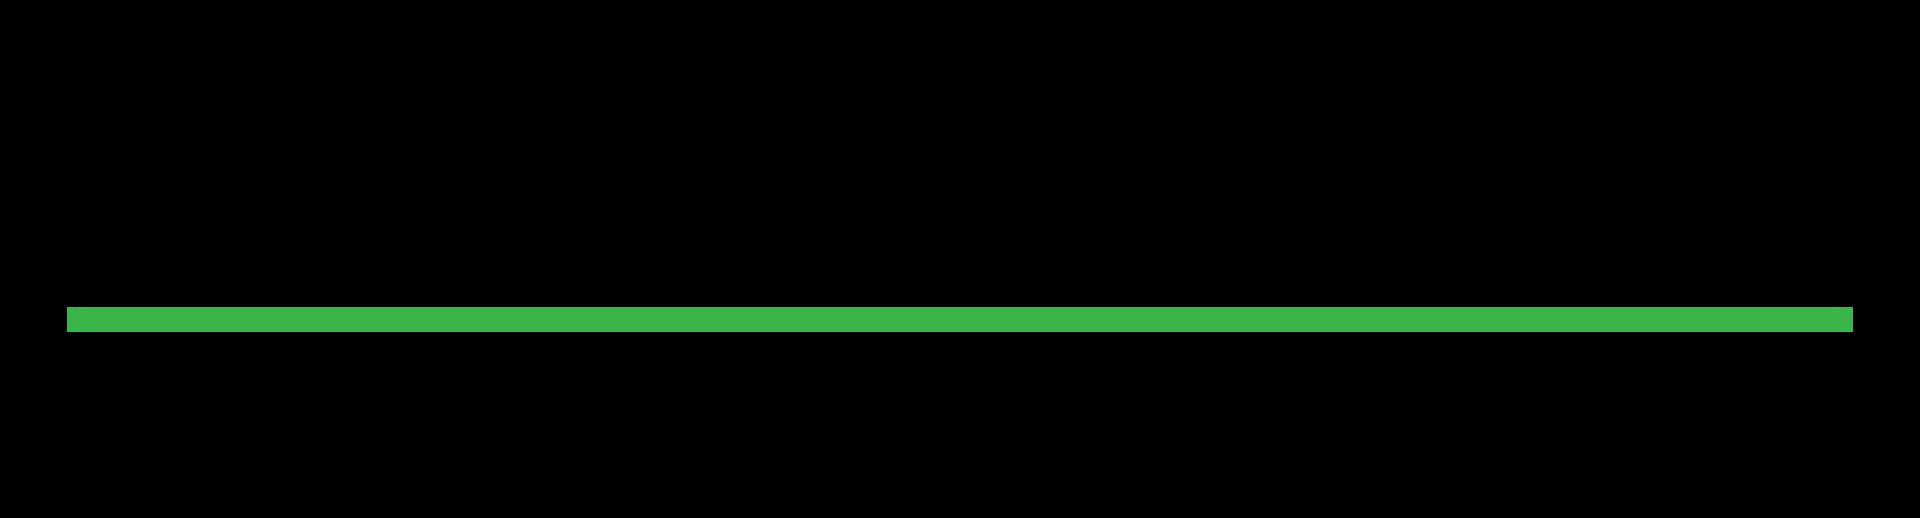 Leasing To Buy NC logo